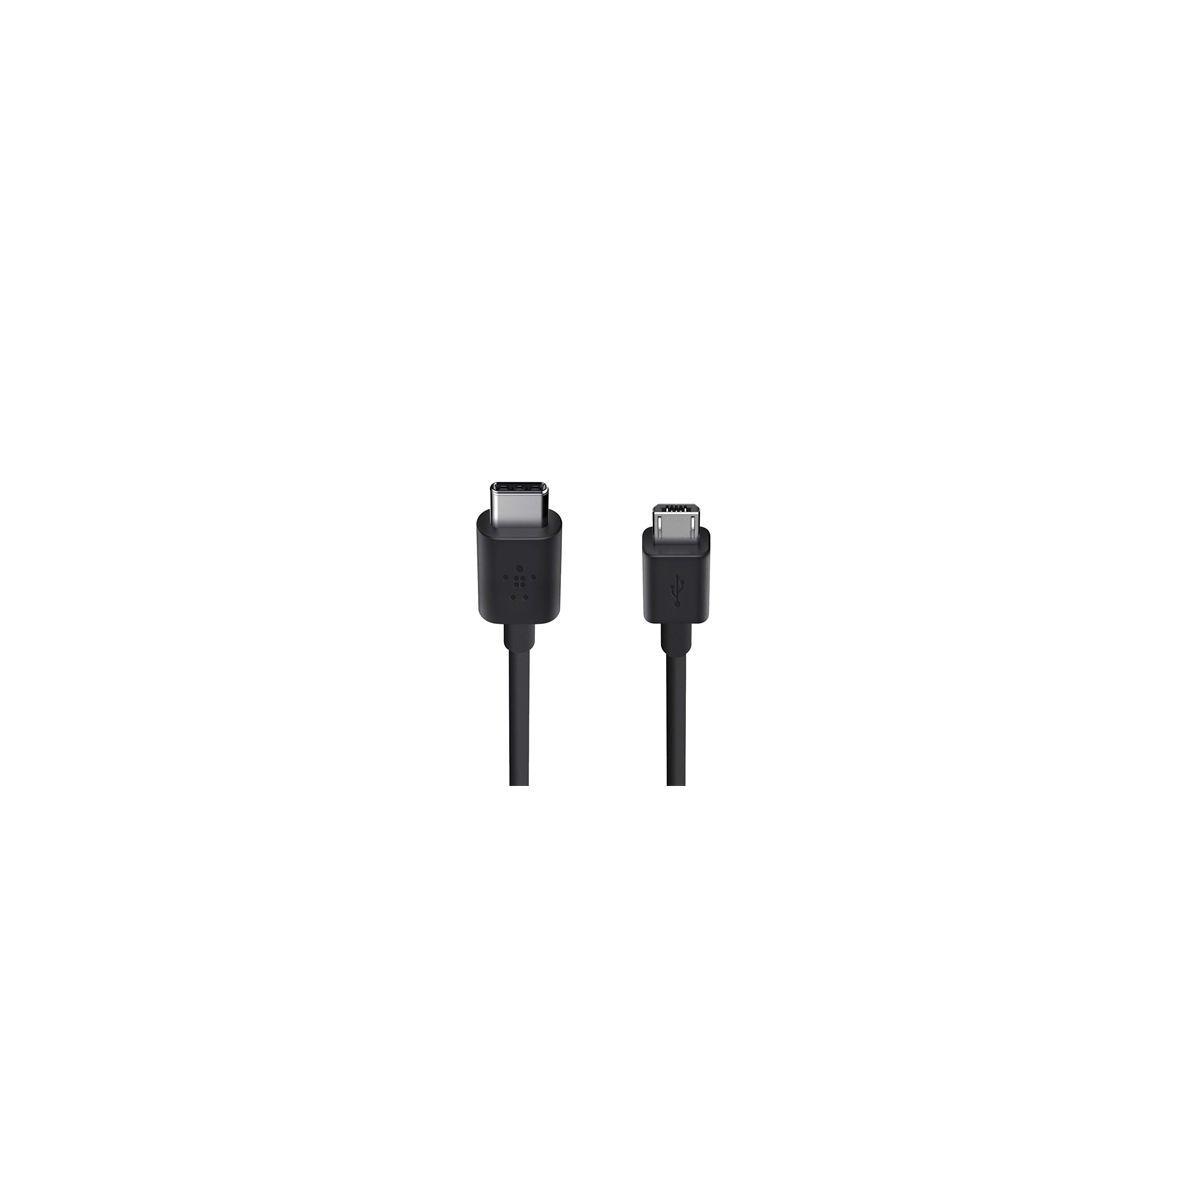 Câble belkin 1m80 usb-c vers micro usb - 10% de remise immédiate avec le code : multi10 (photo)